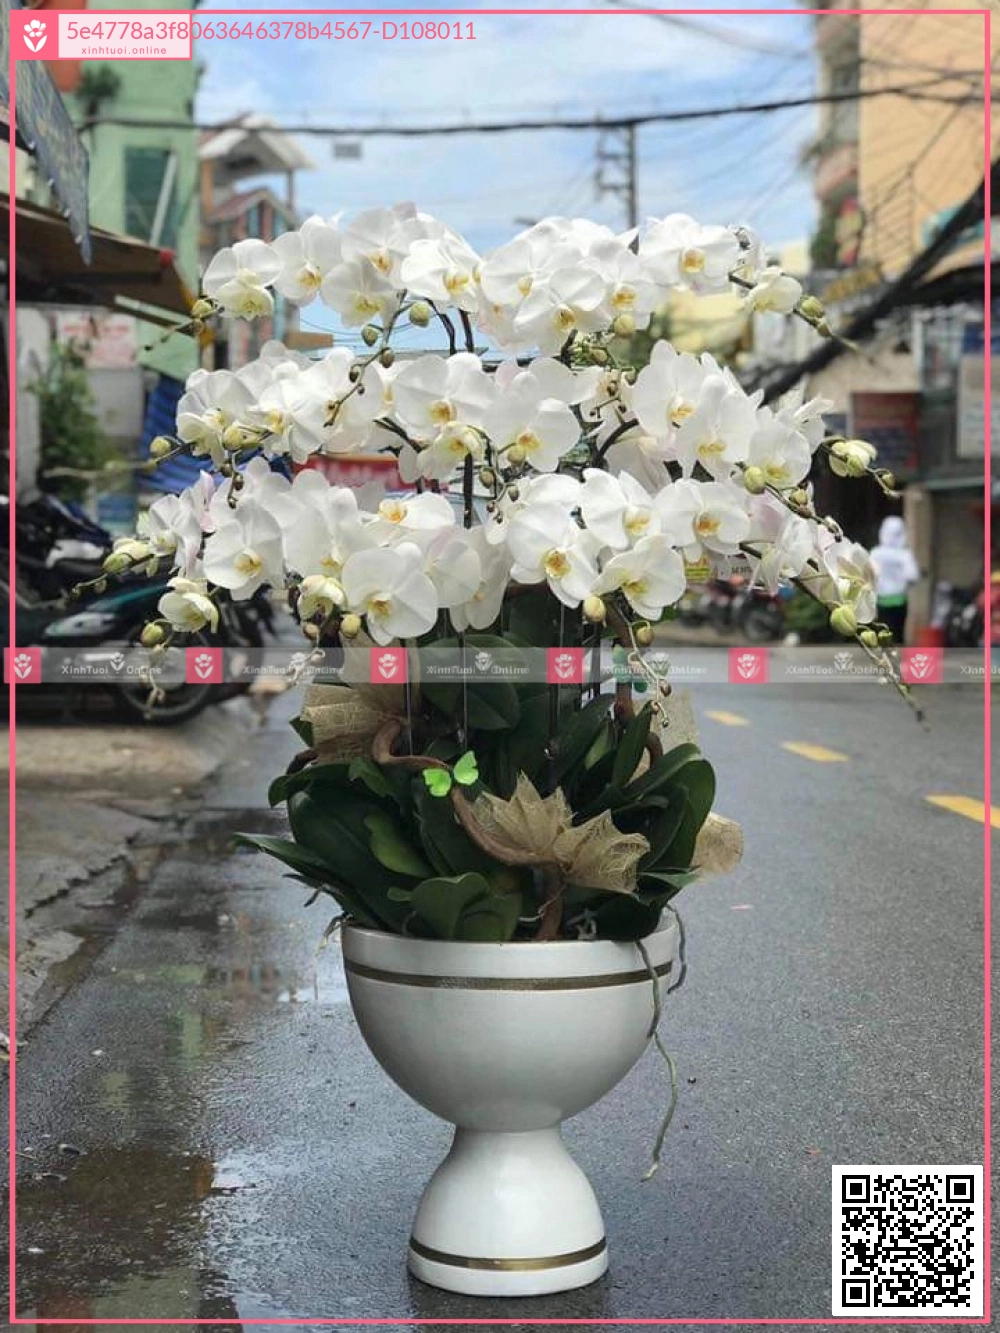 Mùa yêu - D108011 - xinhtuoi.online